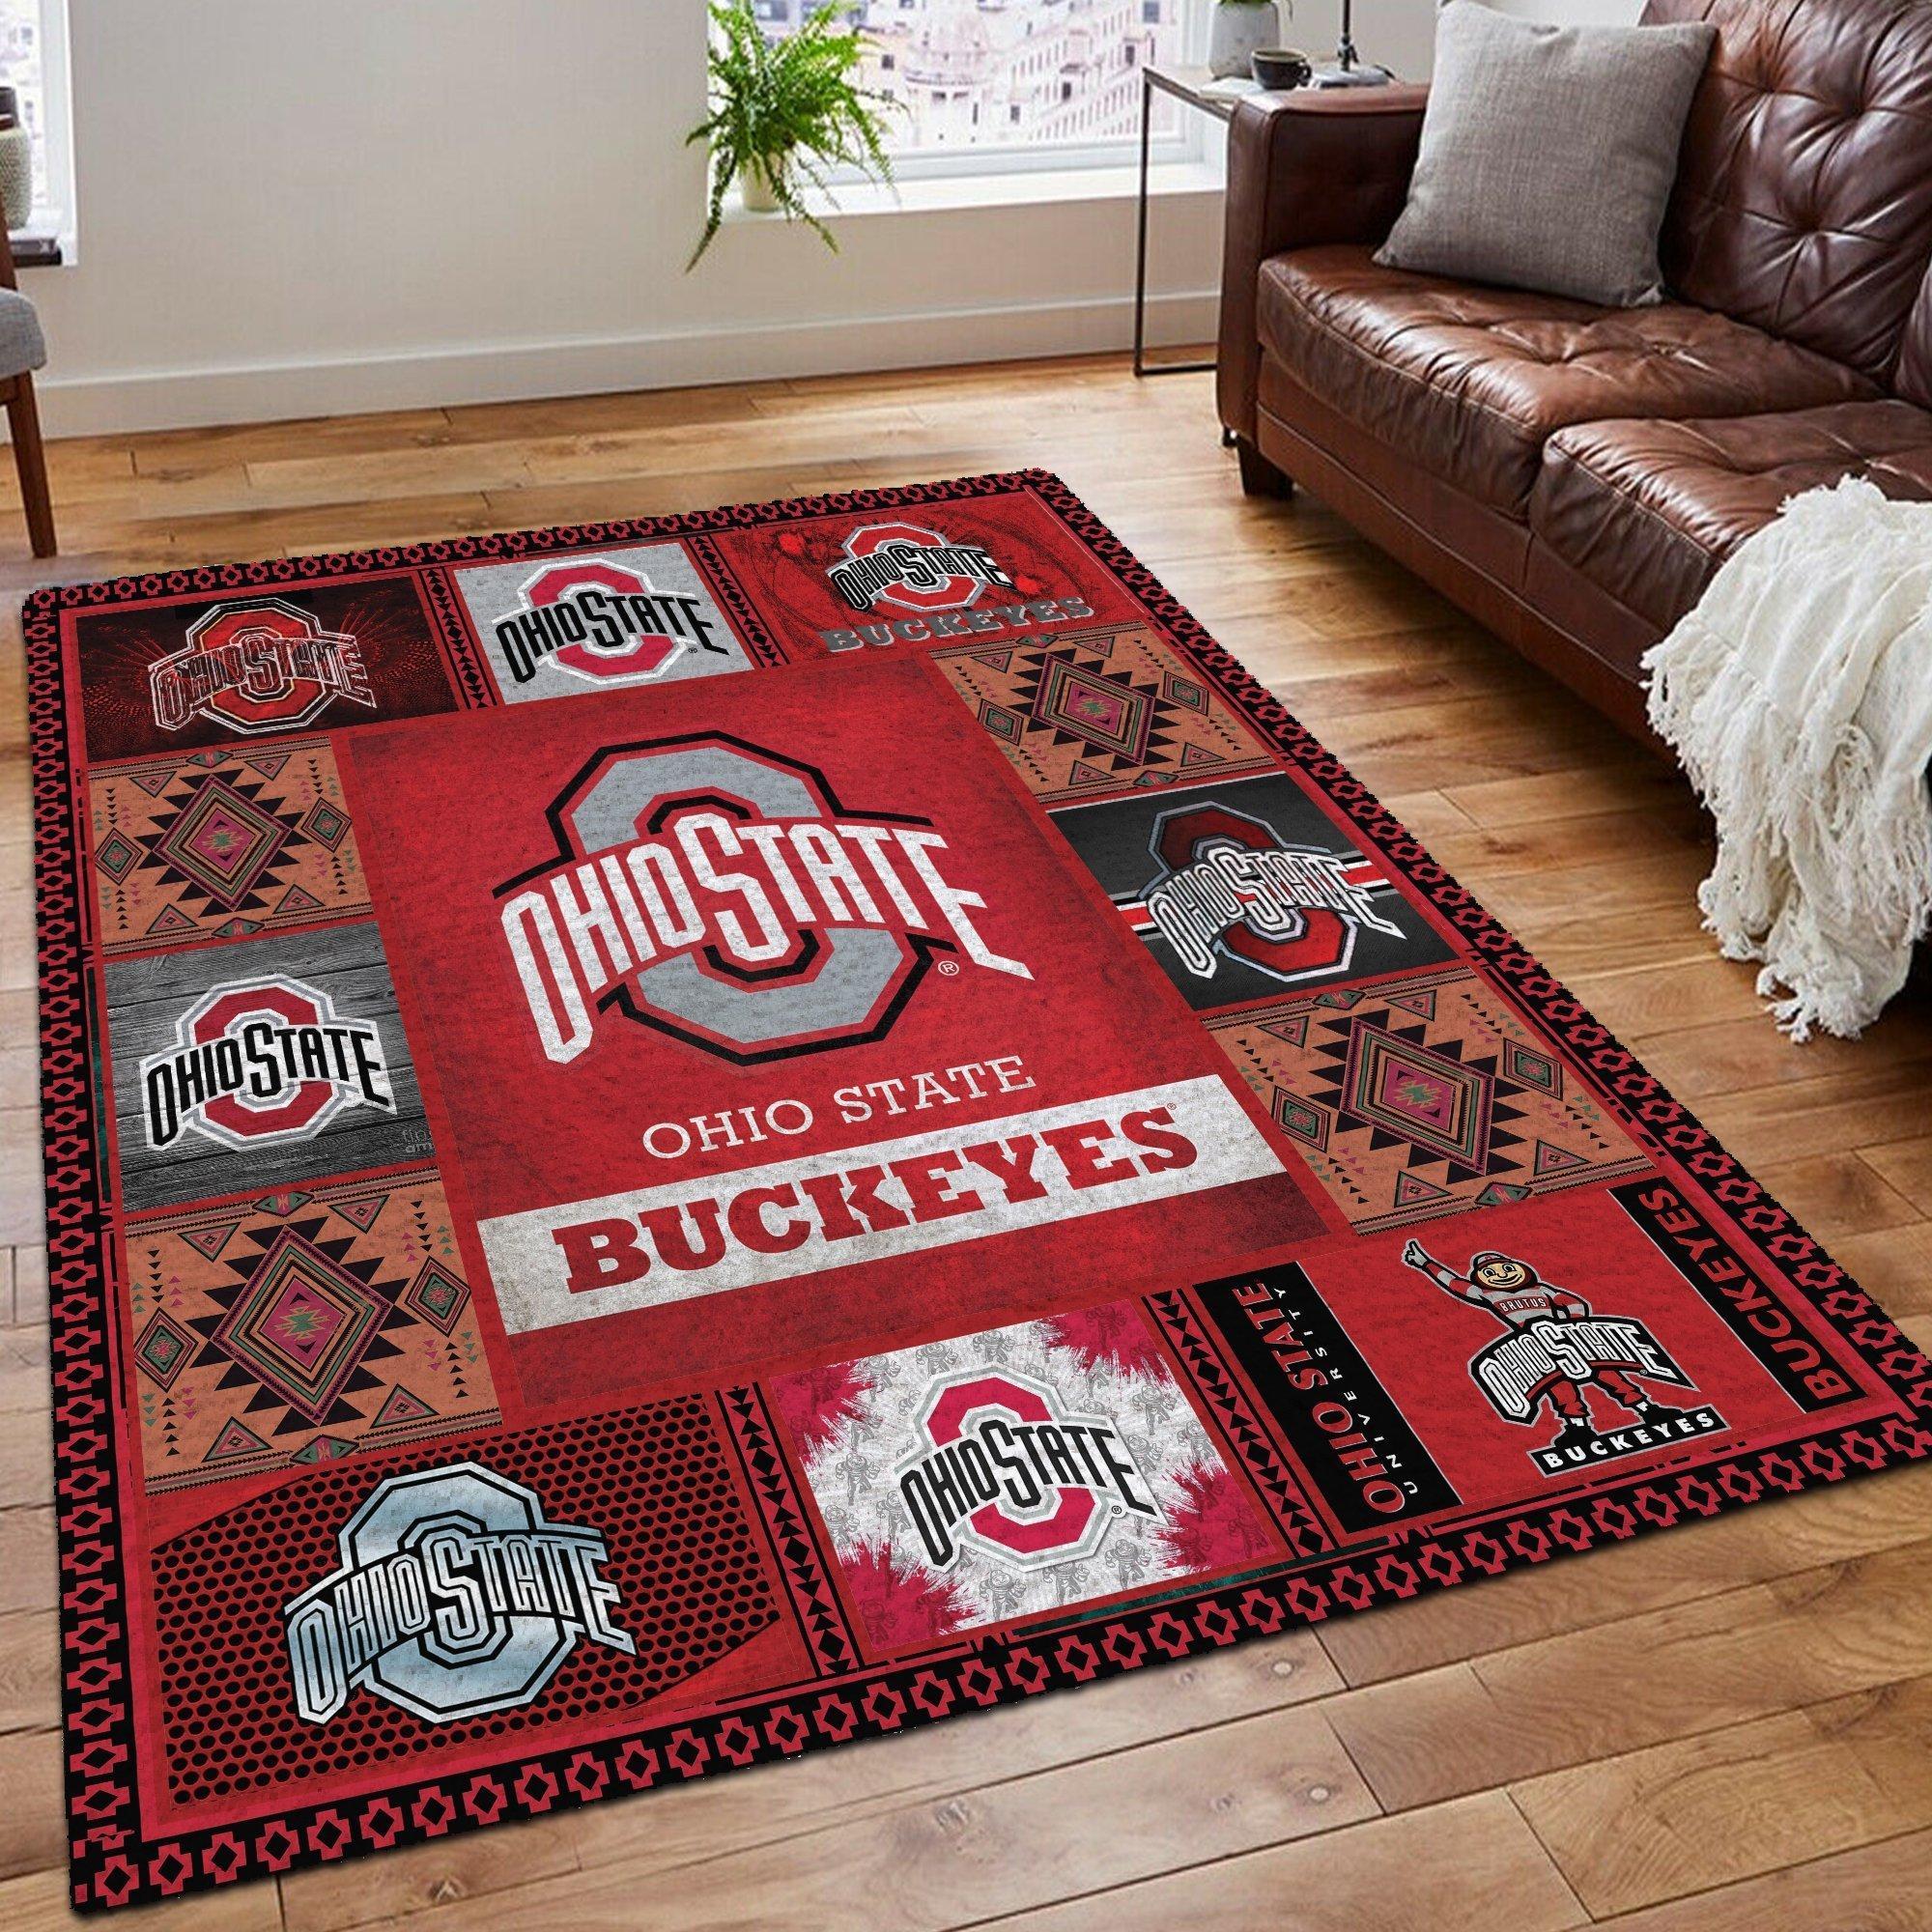 Ohio state buckeyes living room rug 1- maria